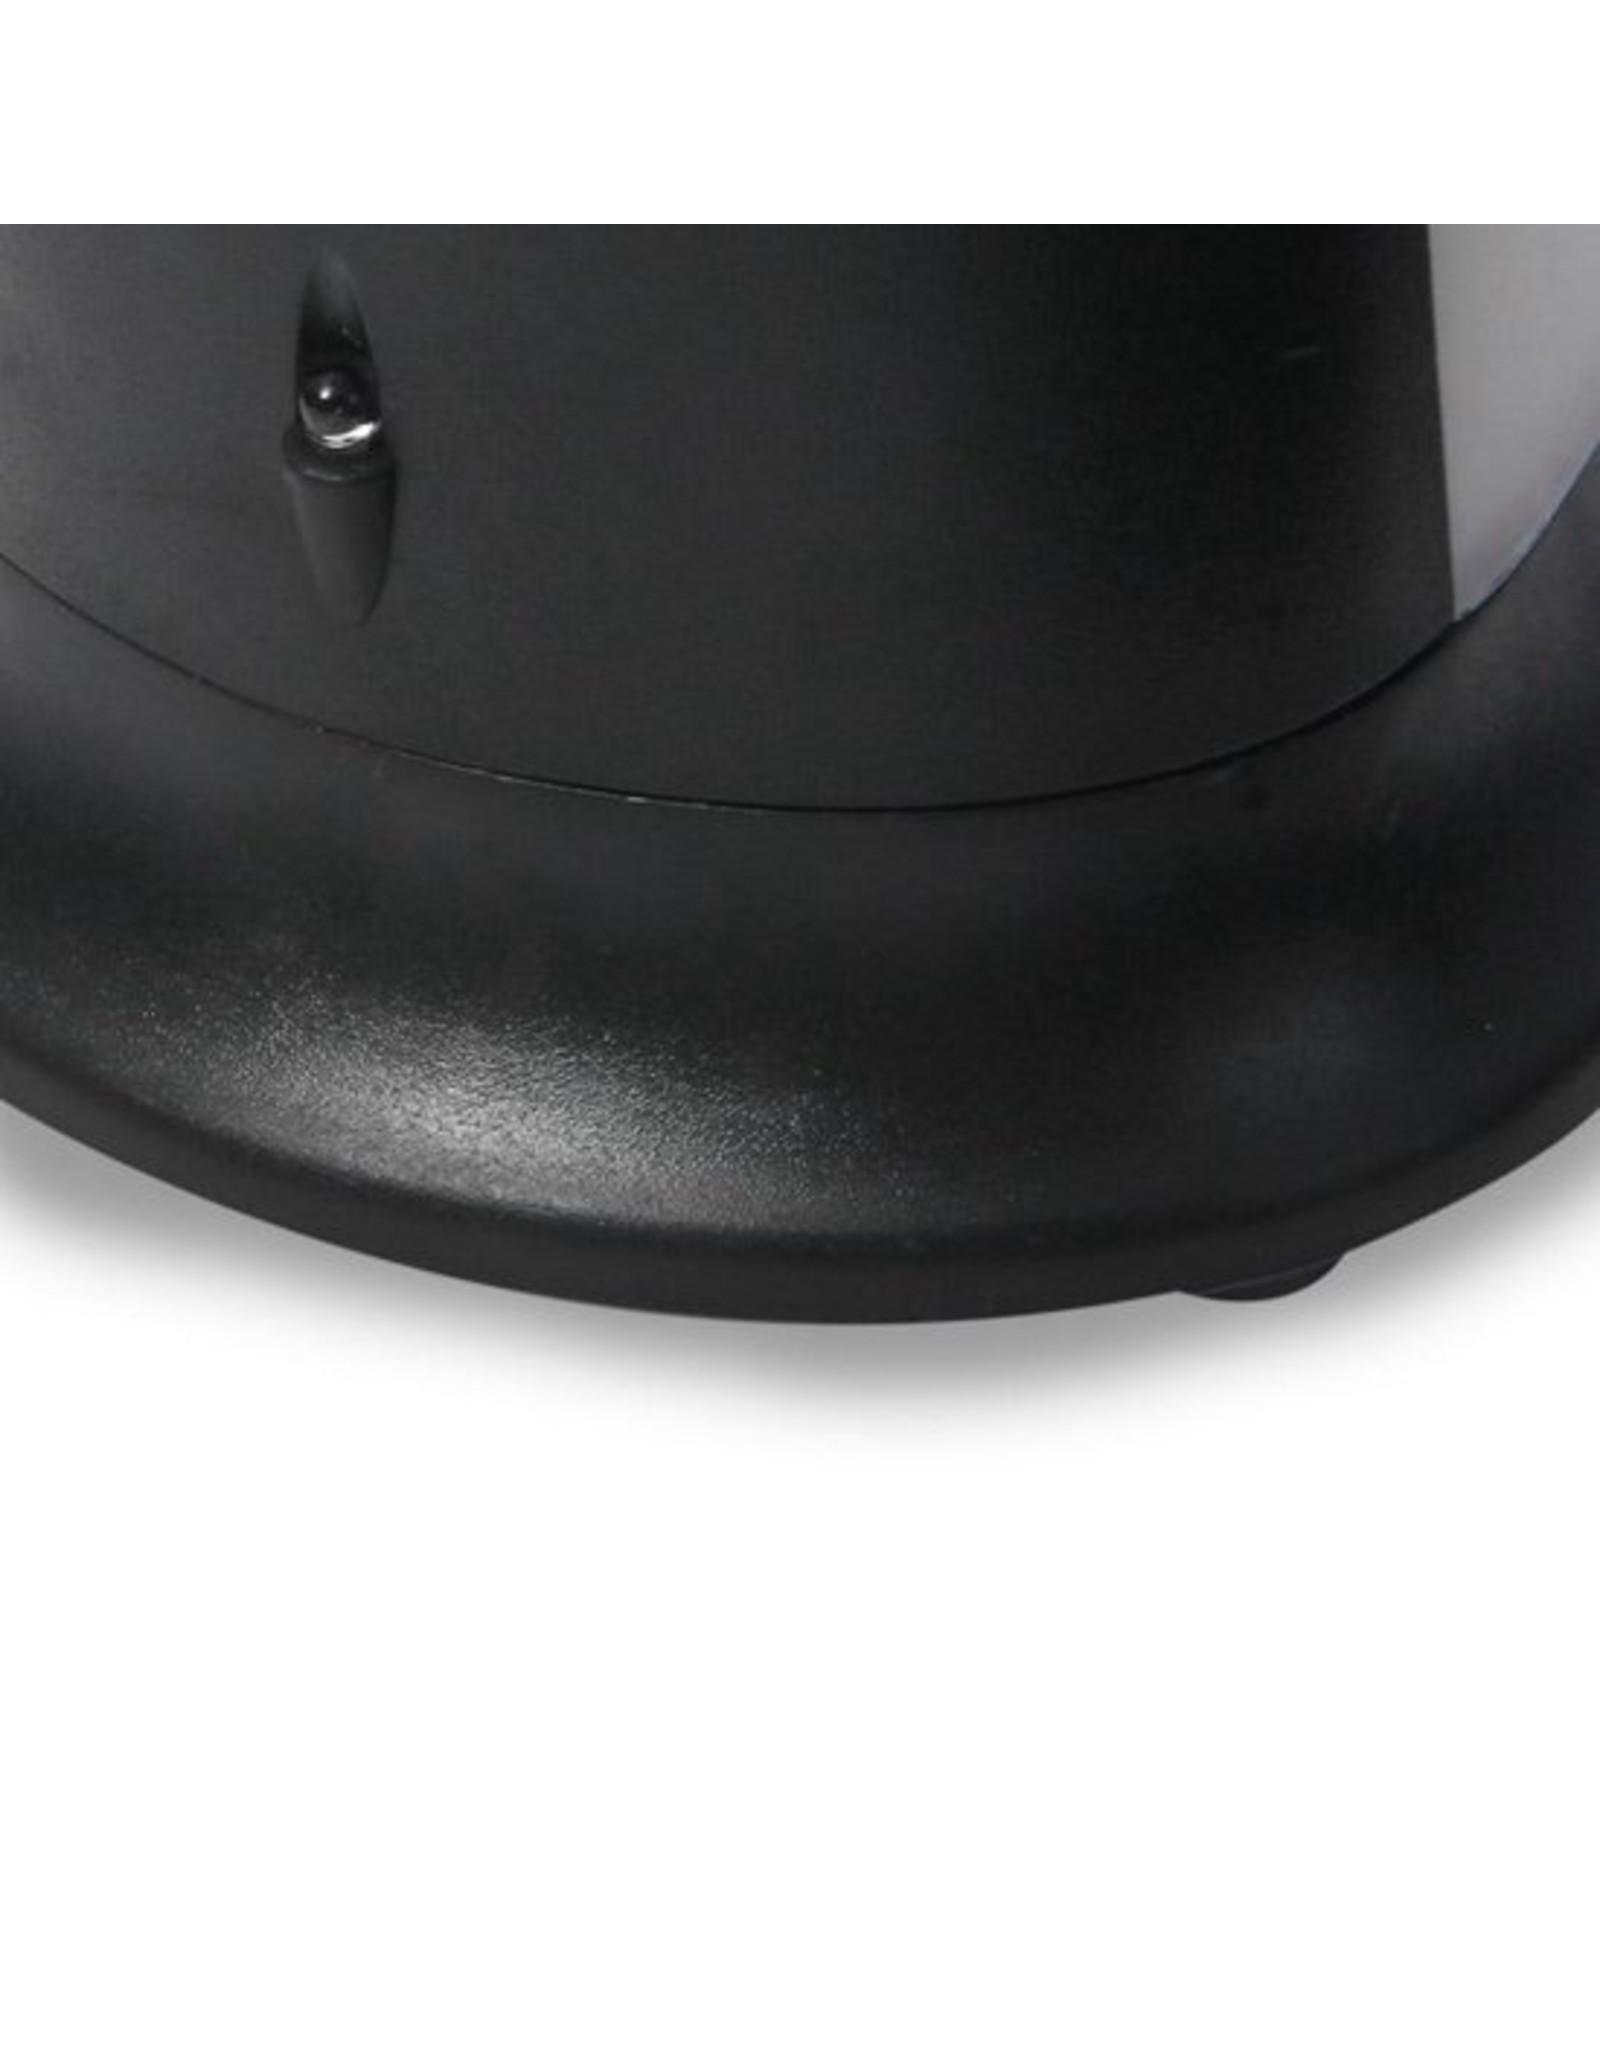 Merkloos Hygiënische automatische zeepdispenser